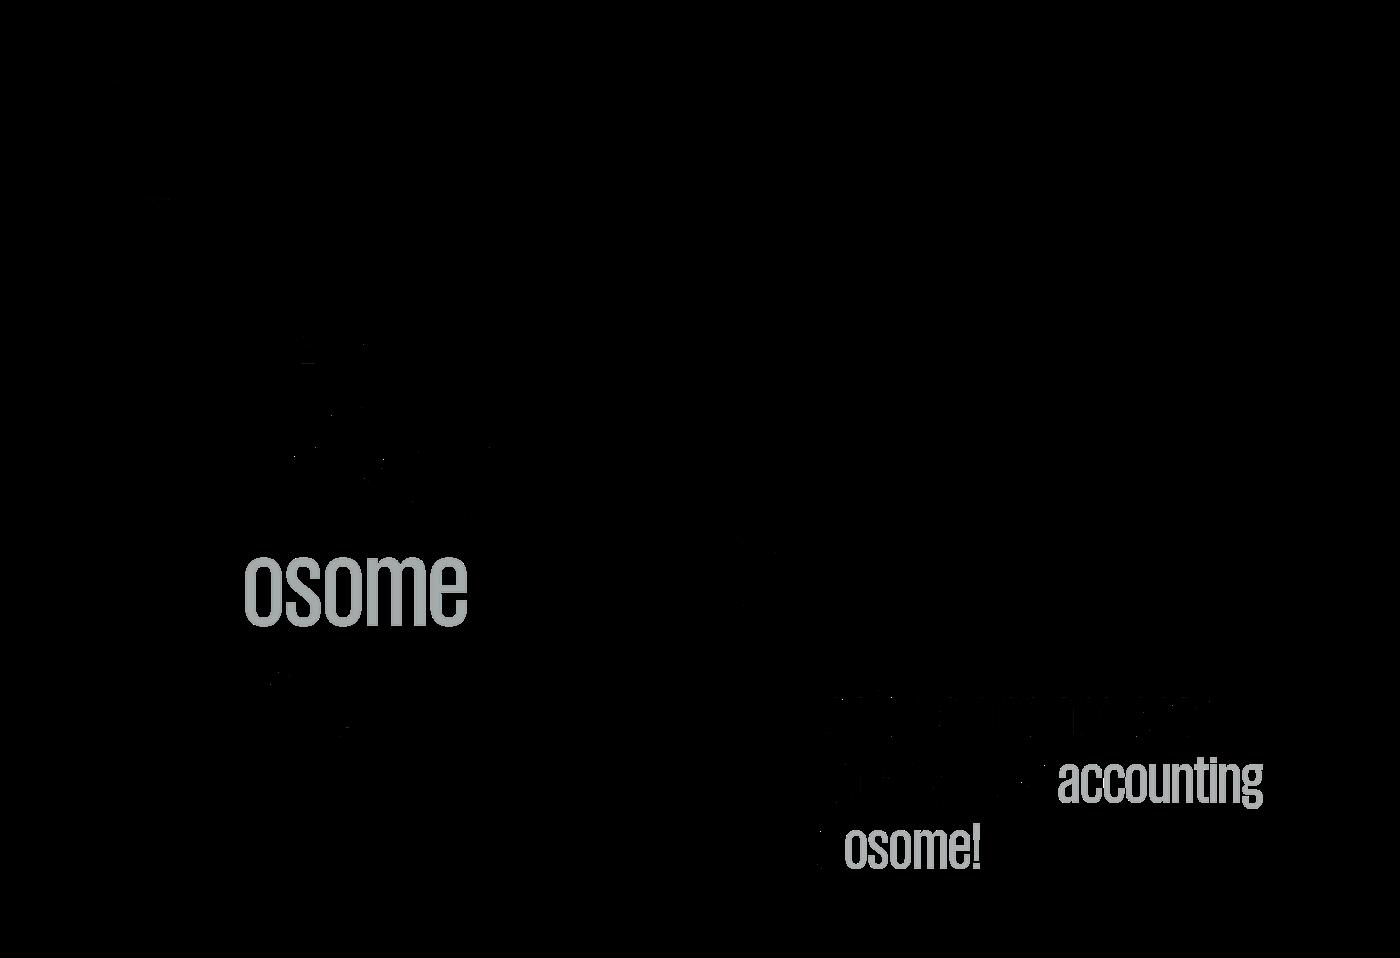 Бизнес-помощник Osome